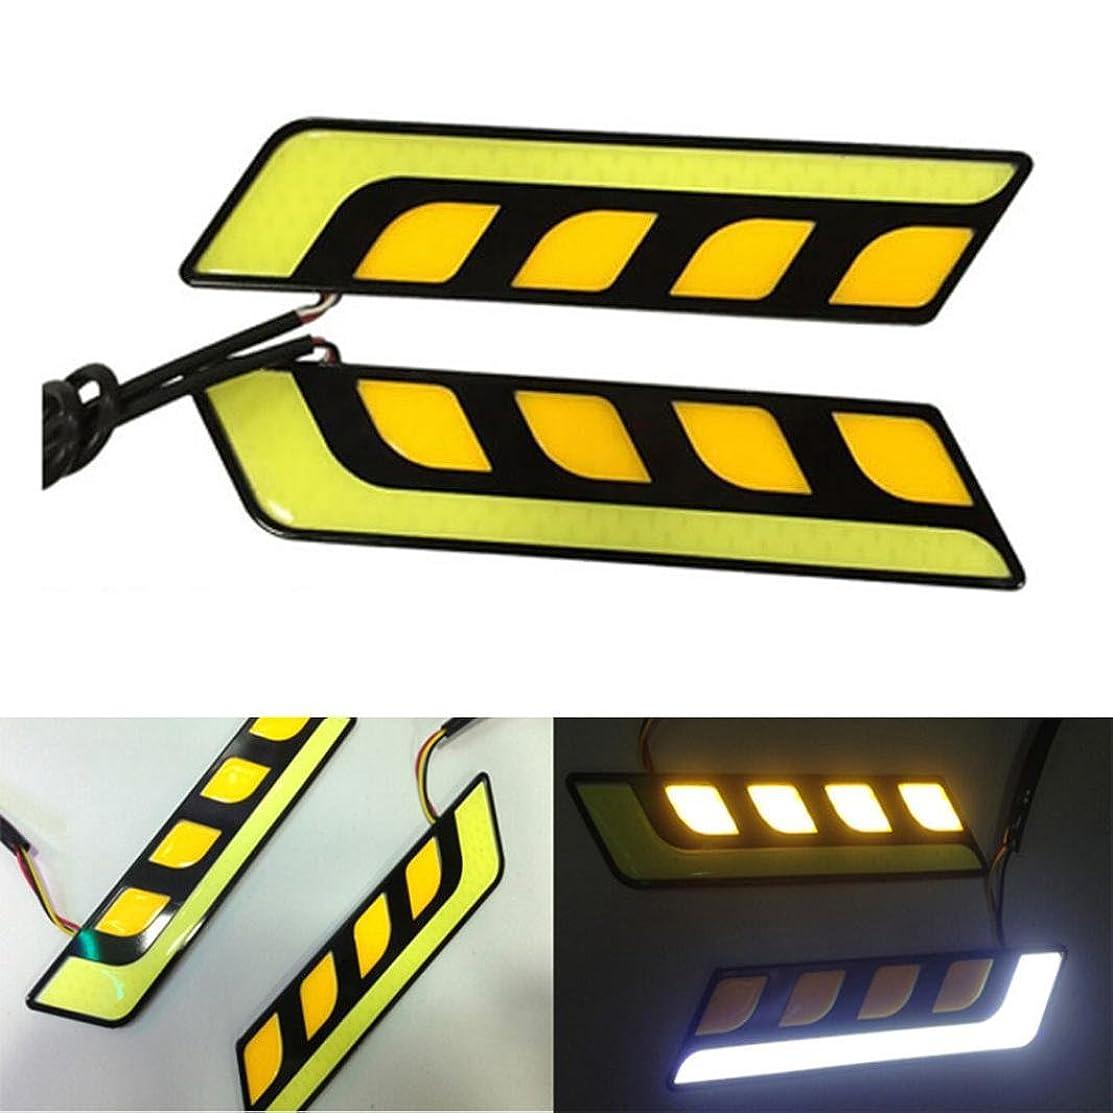 Quaant Car LED Light,Car Styling Car Accessories 2 PCS Daytime Running Lights COB LED Car DRL LED Light Bar Turn Signal Lights All In One Fog Lamps (Yellow)